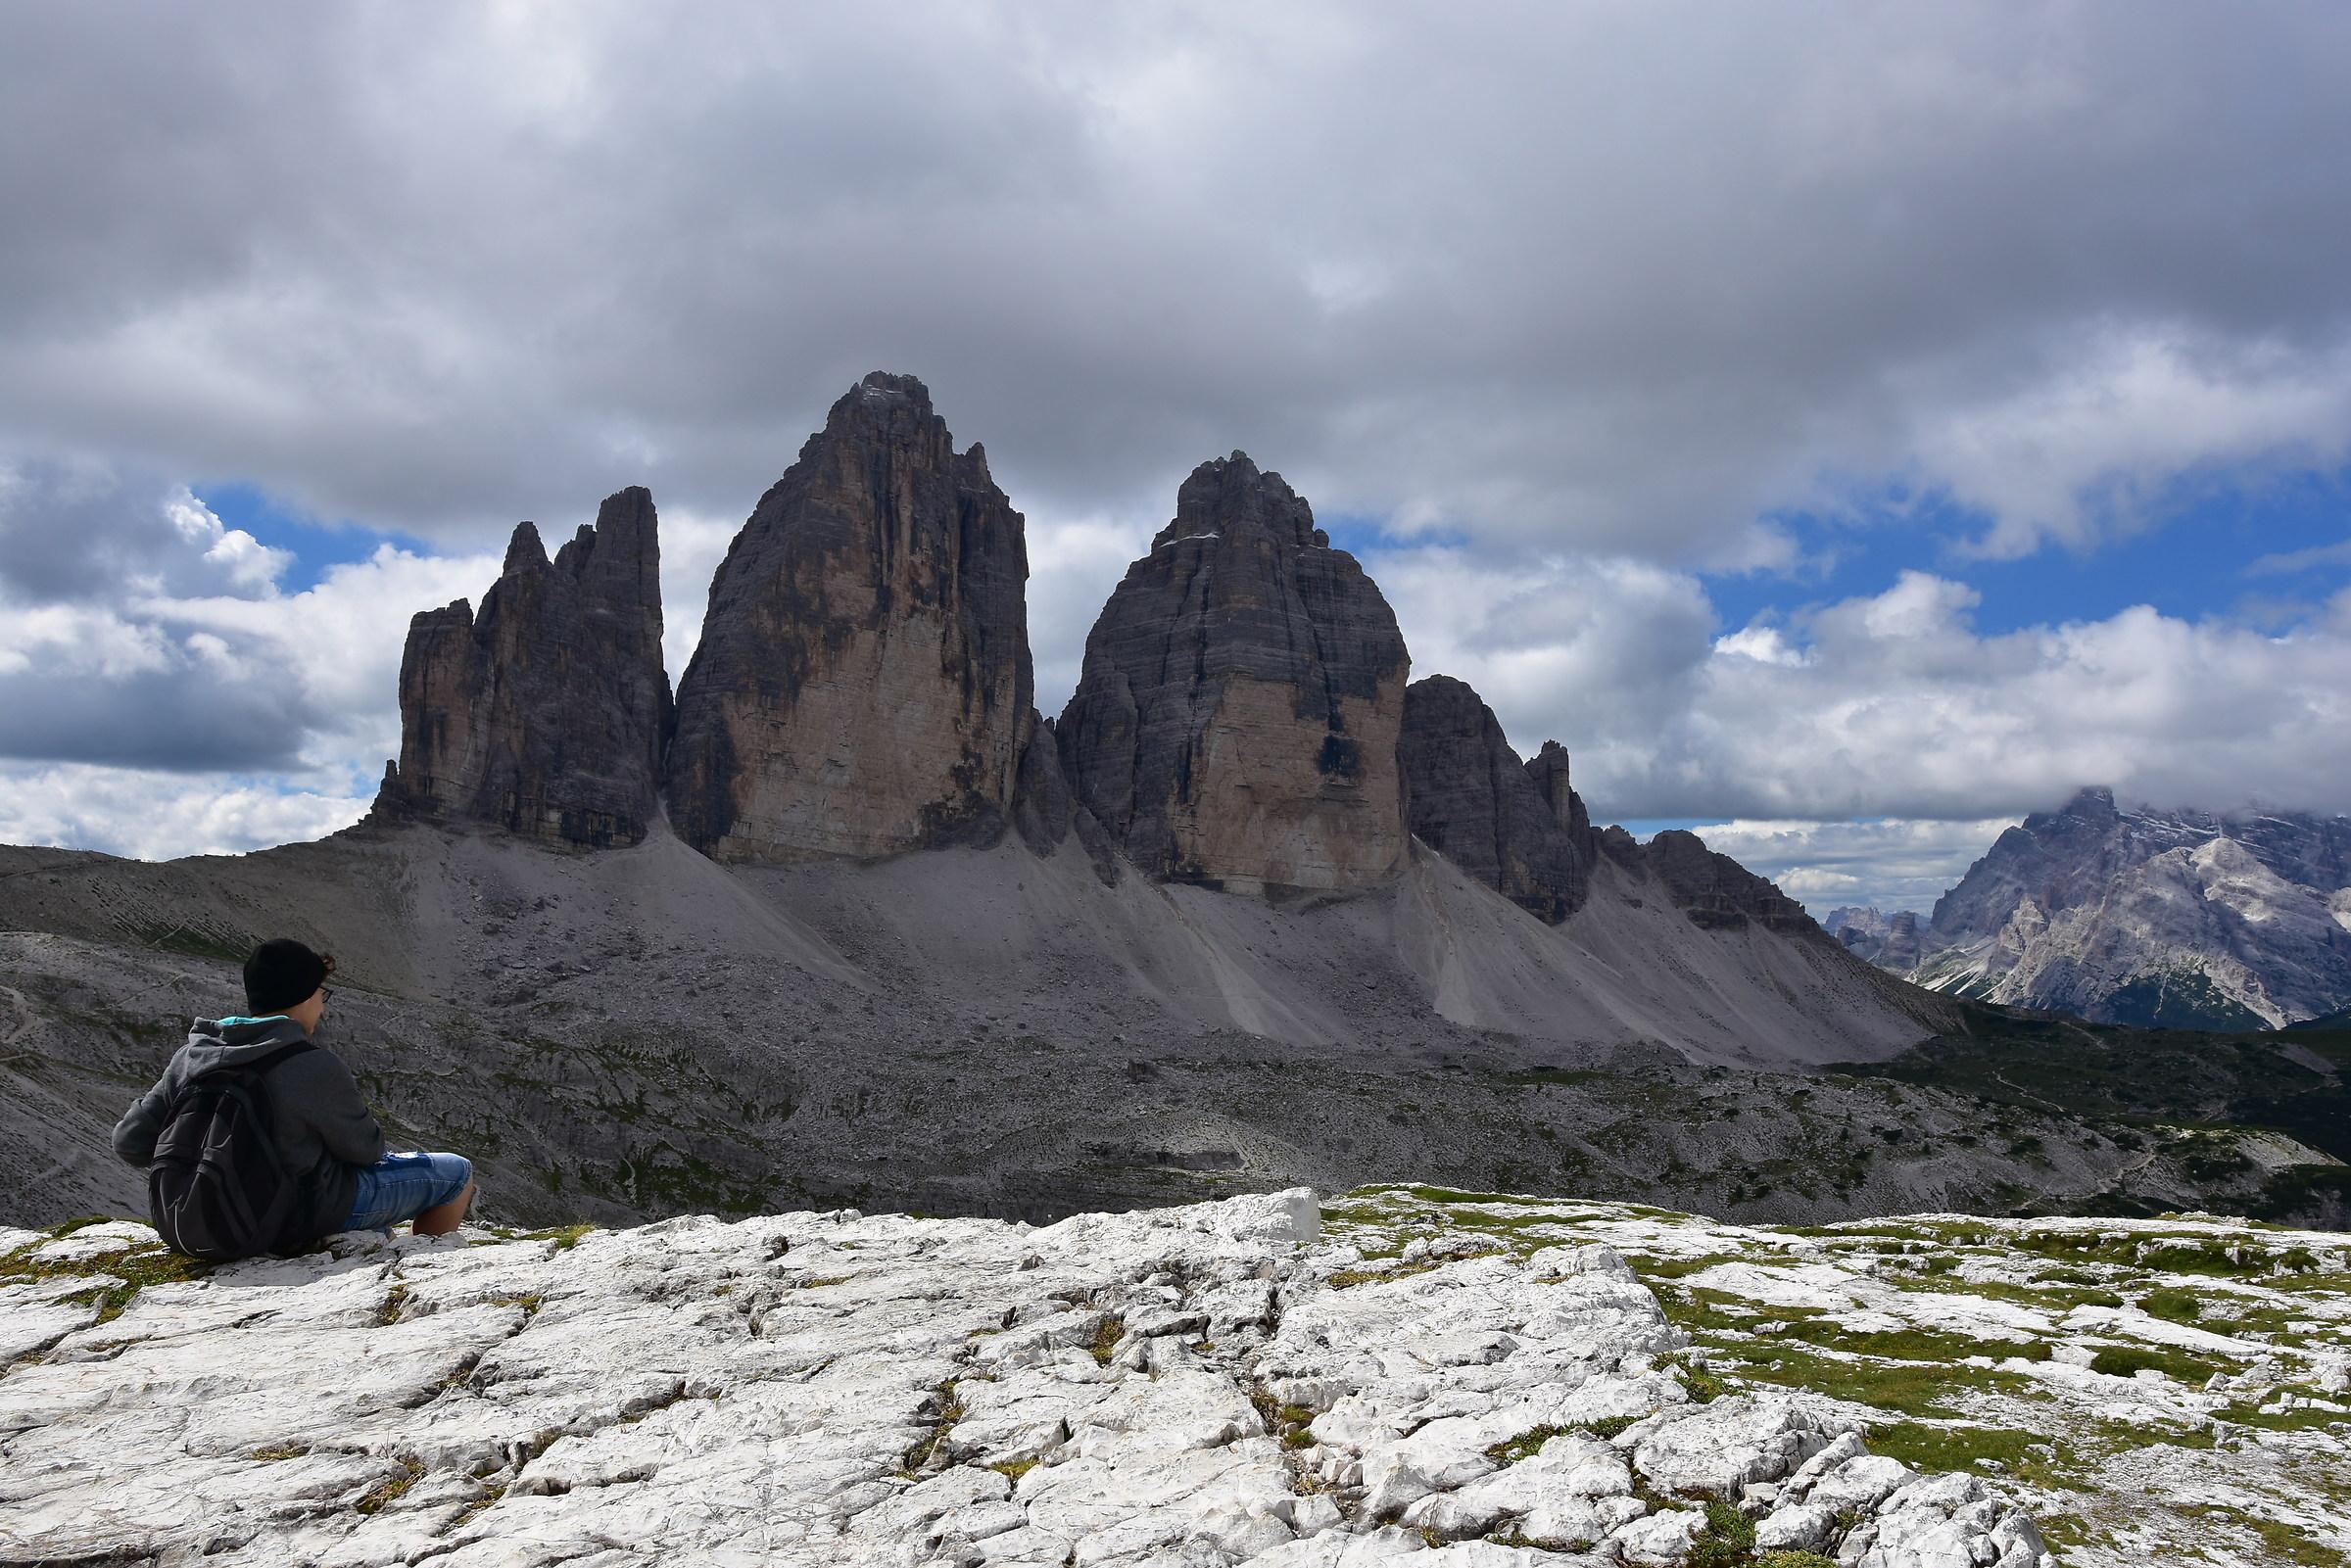 Three Peaks (Federico Enchanted by Panorama)...